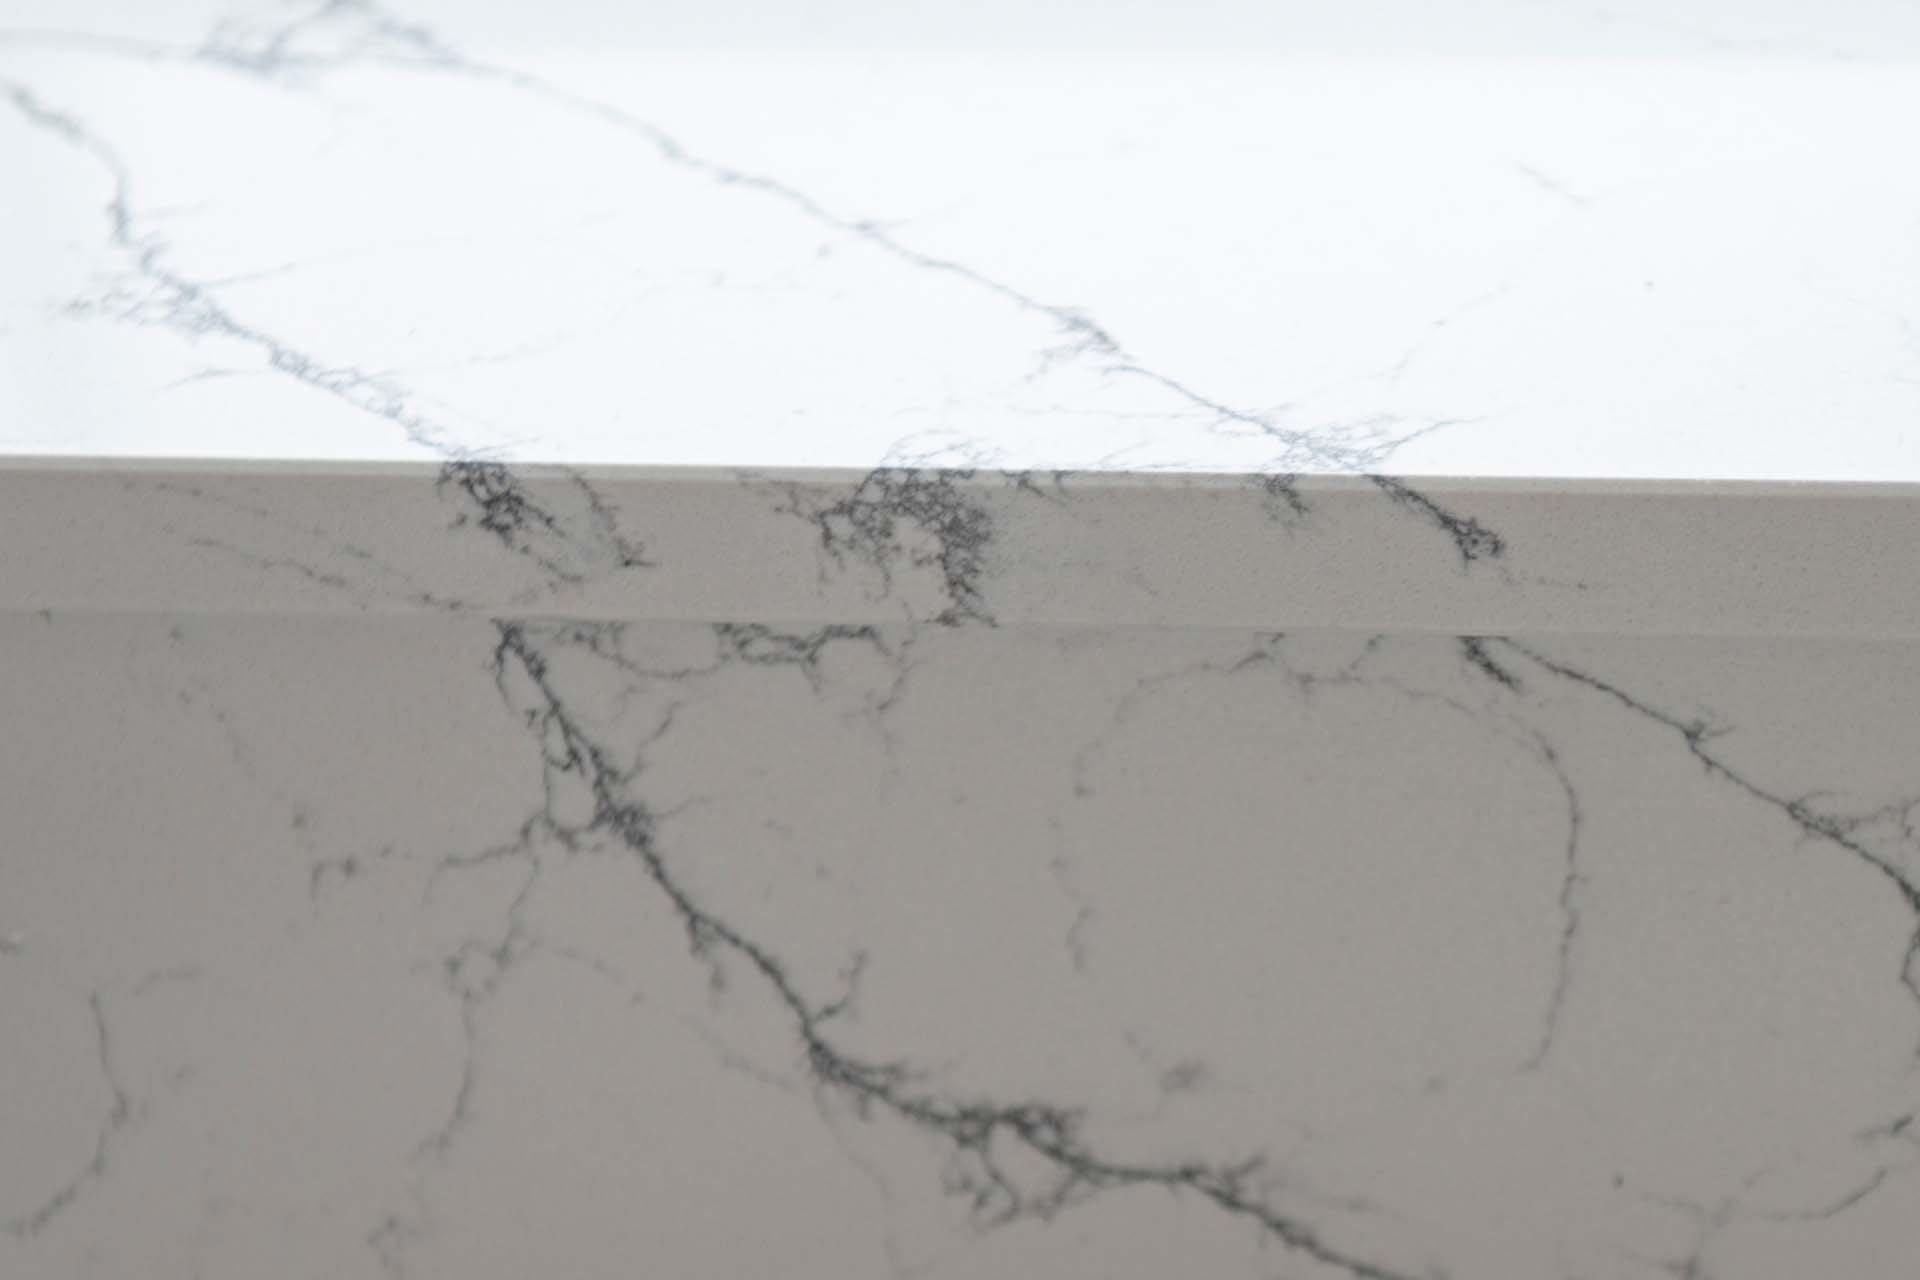 vein-matching Classic Quartz Alaska Bianca quartz worktops Haywards Heath west sussex 190930 143602c